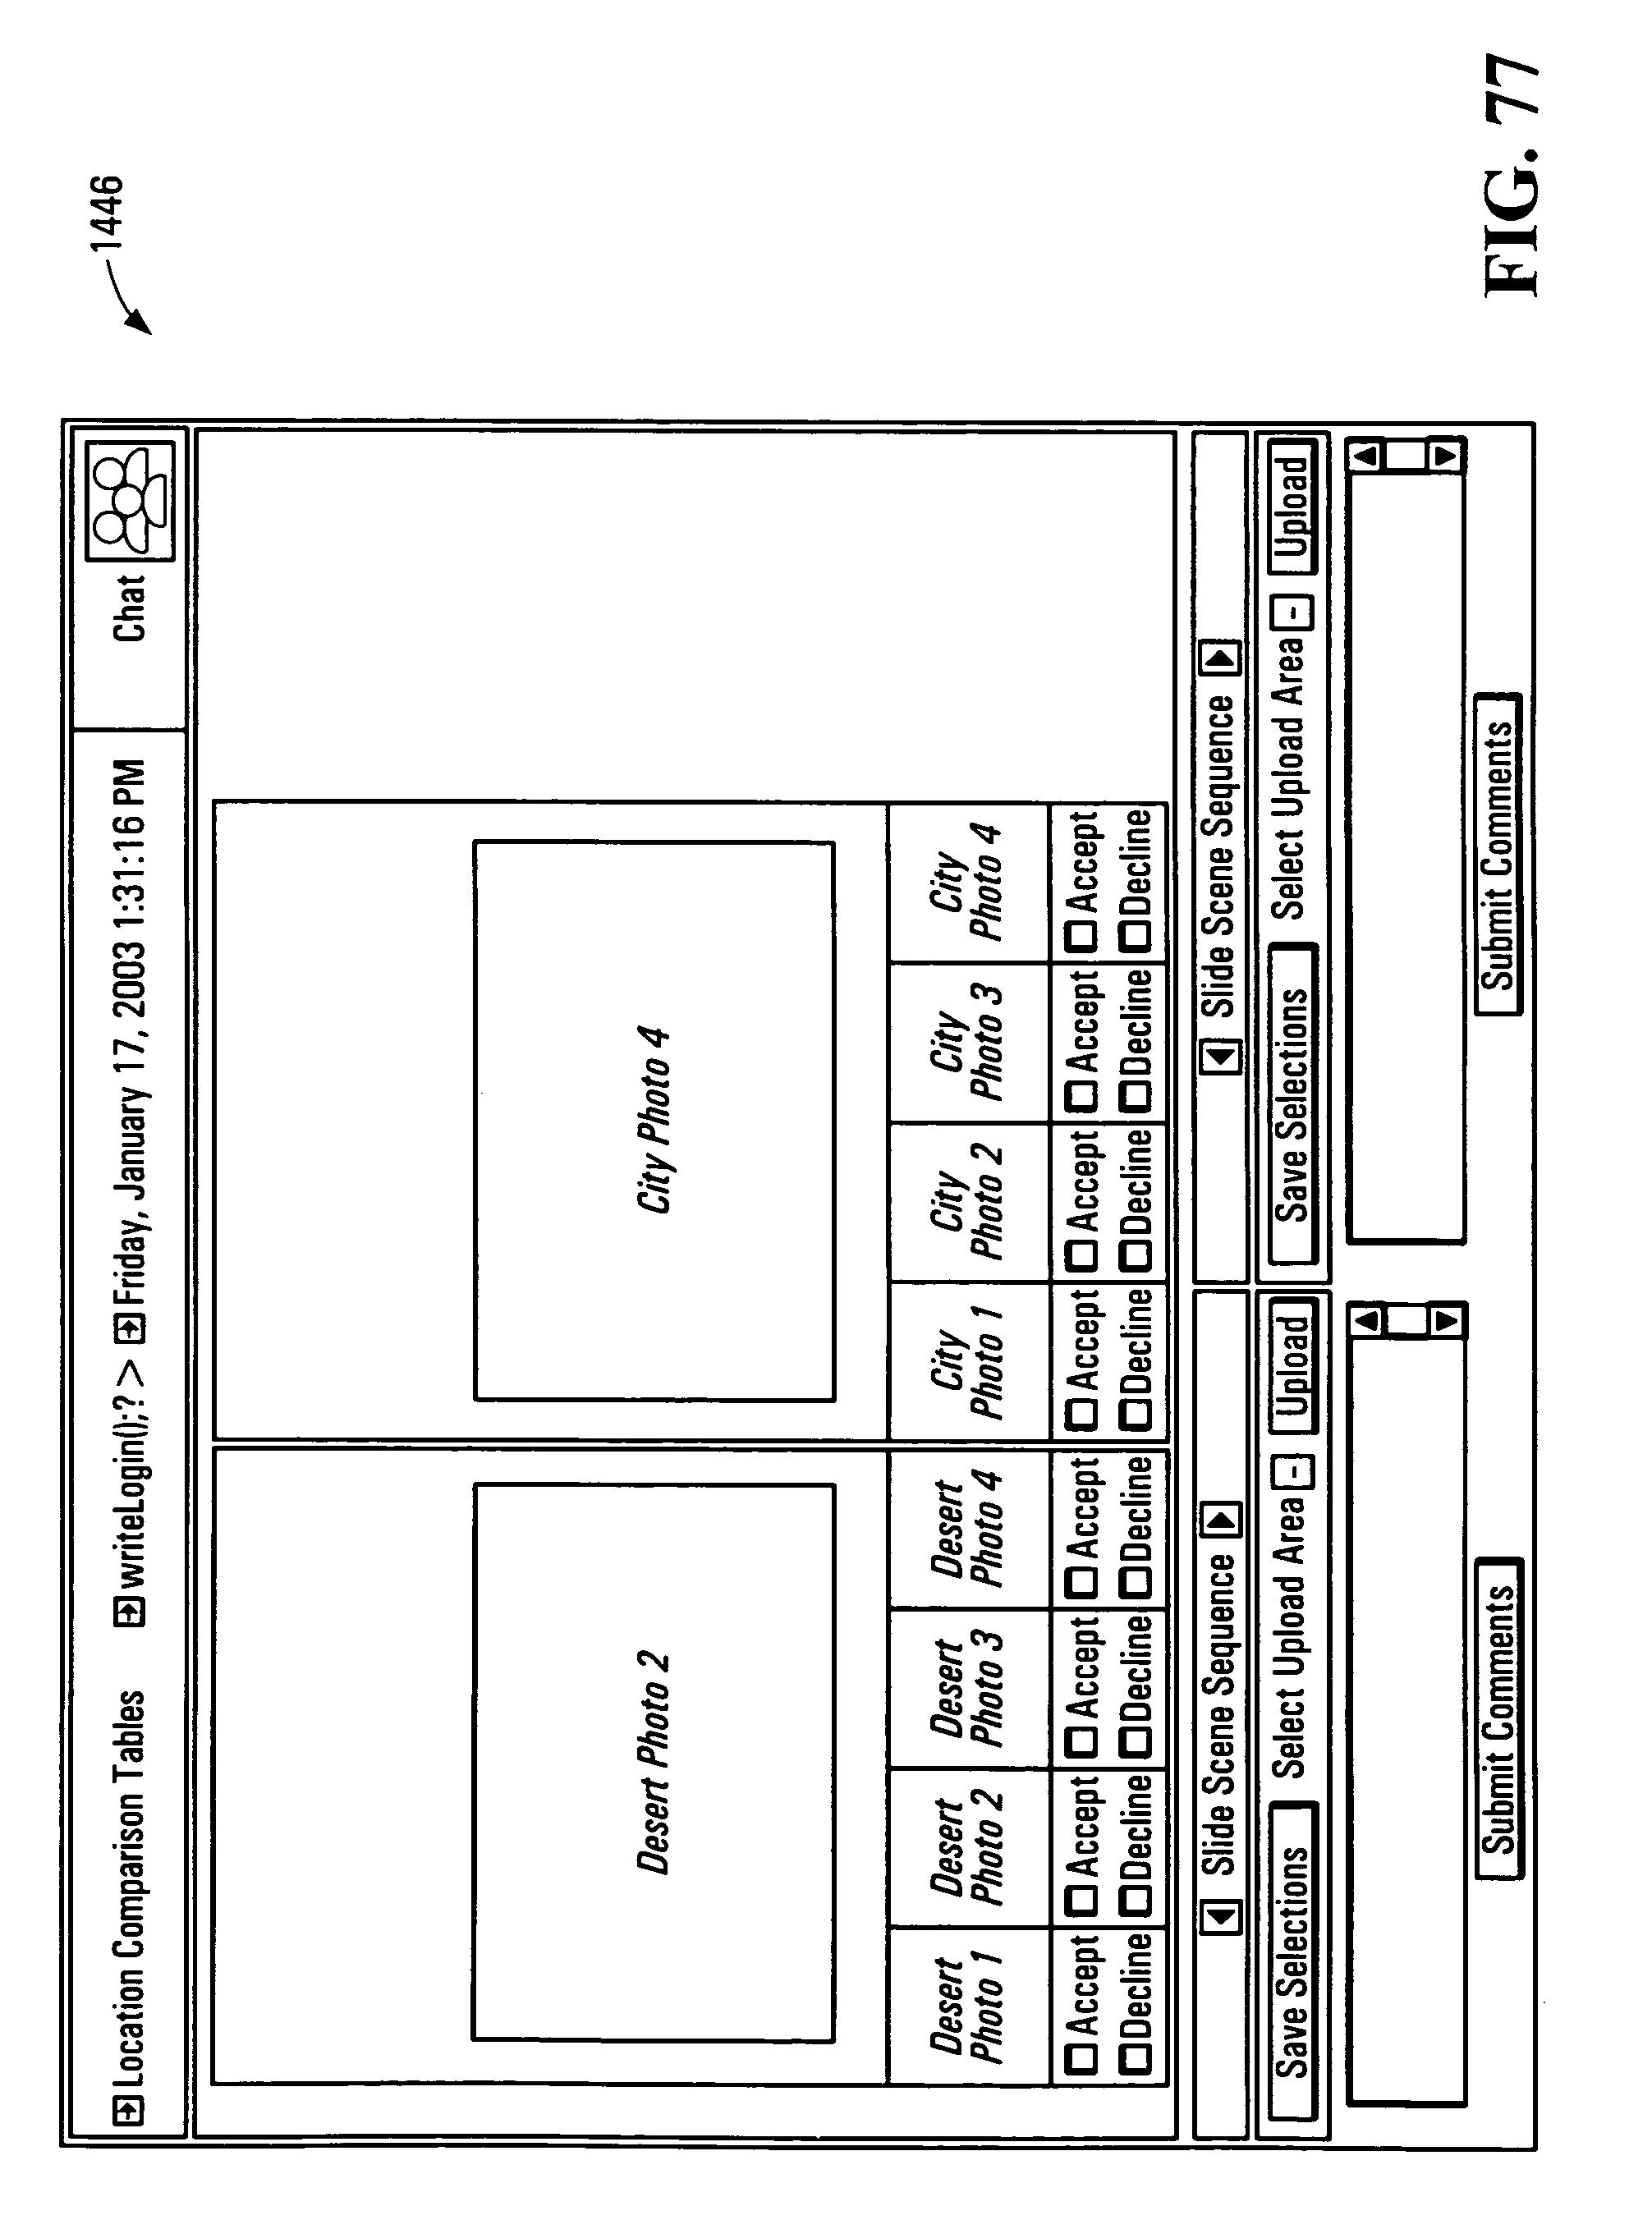 Patent US 7,478,163 B2